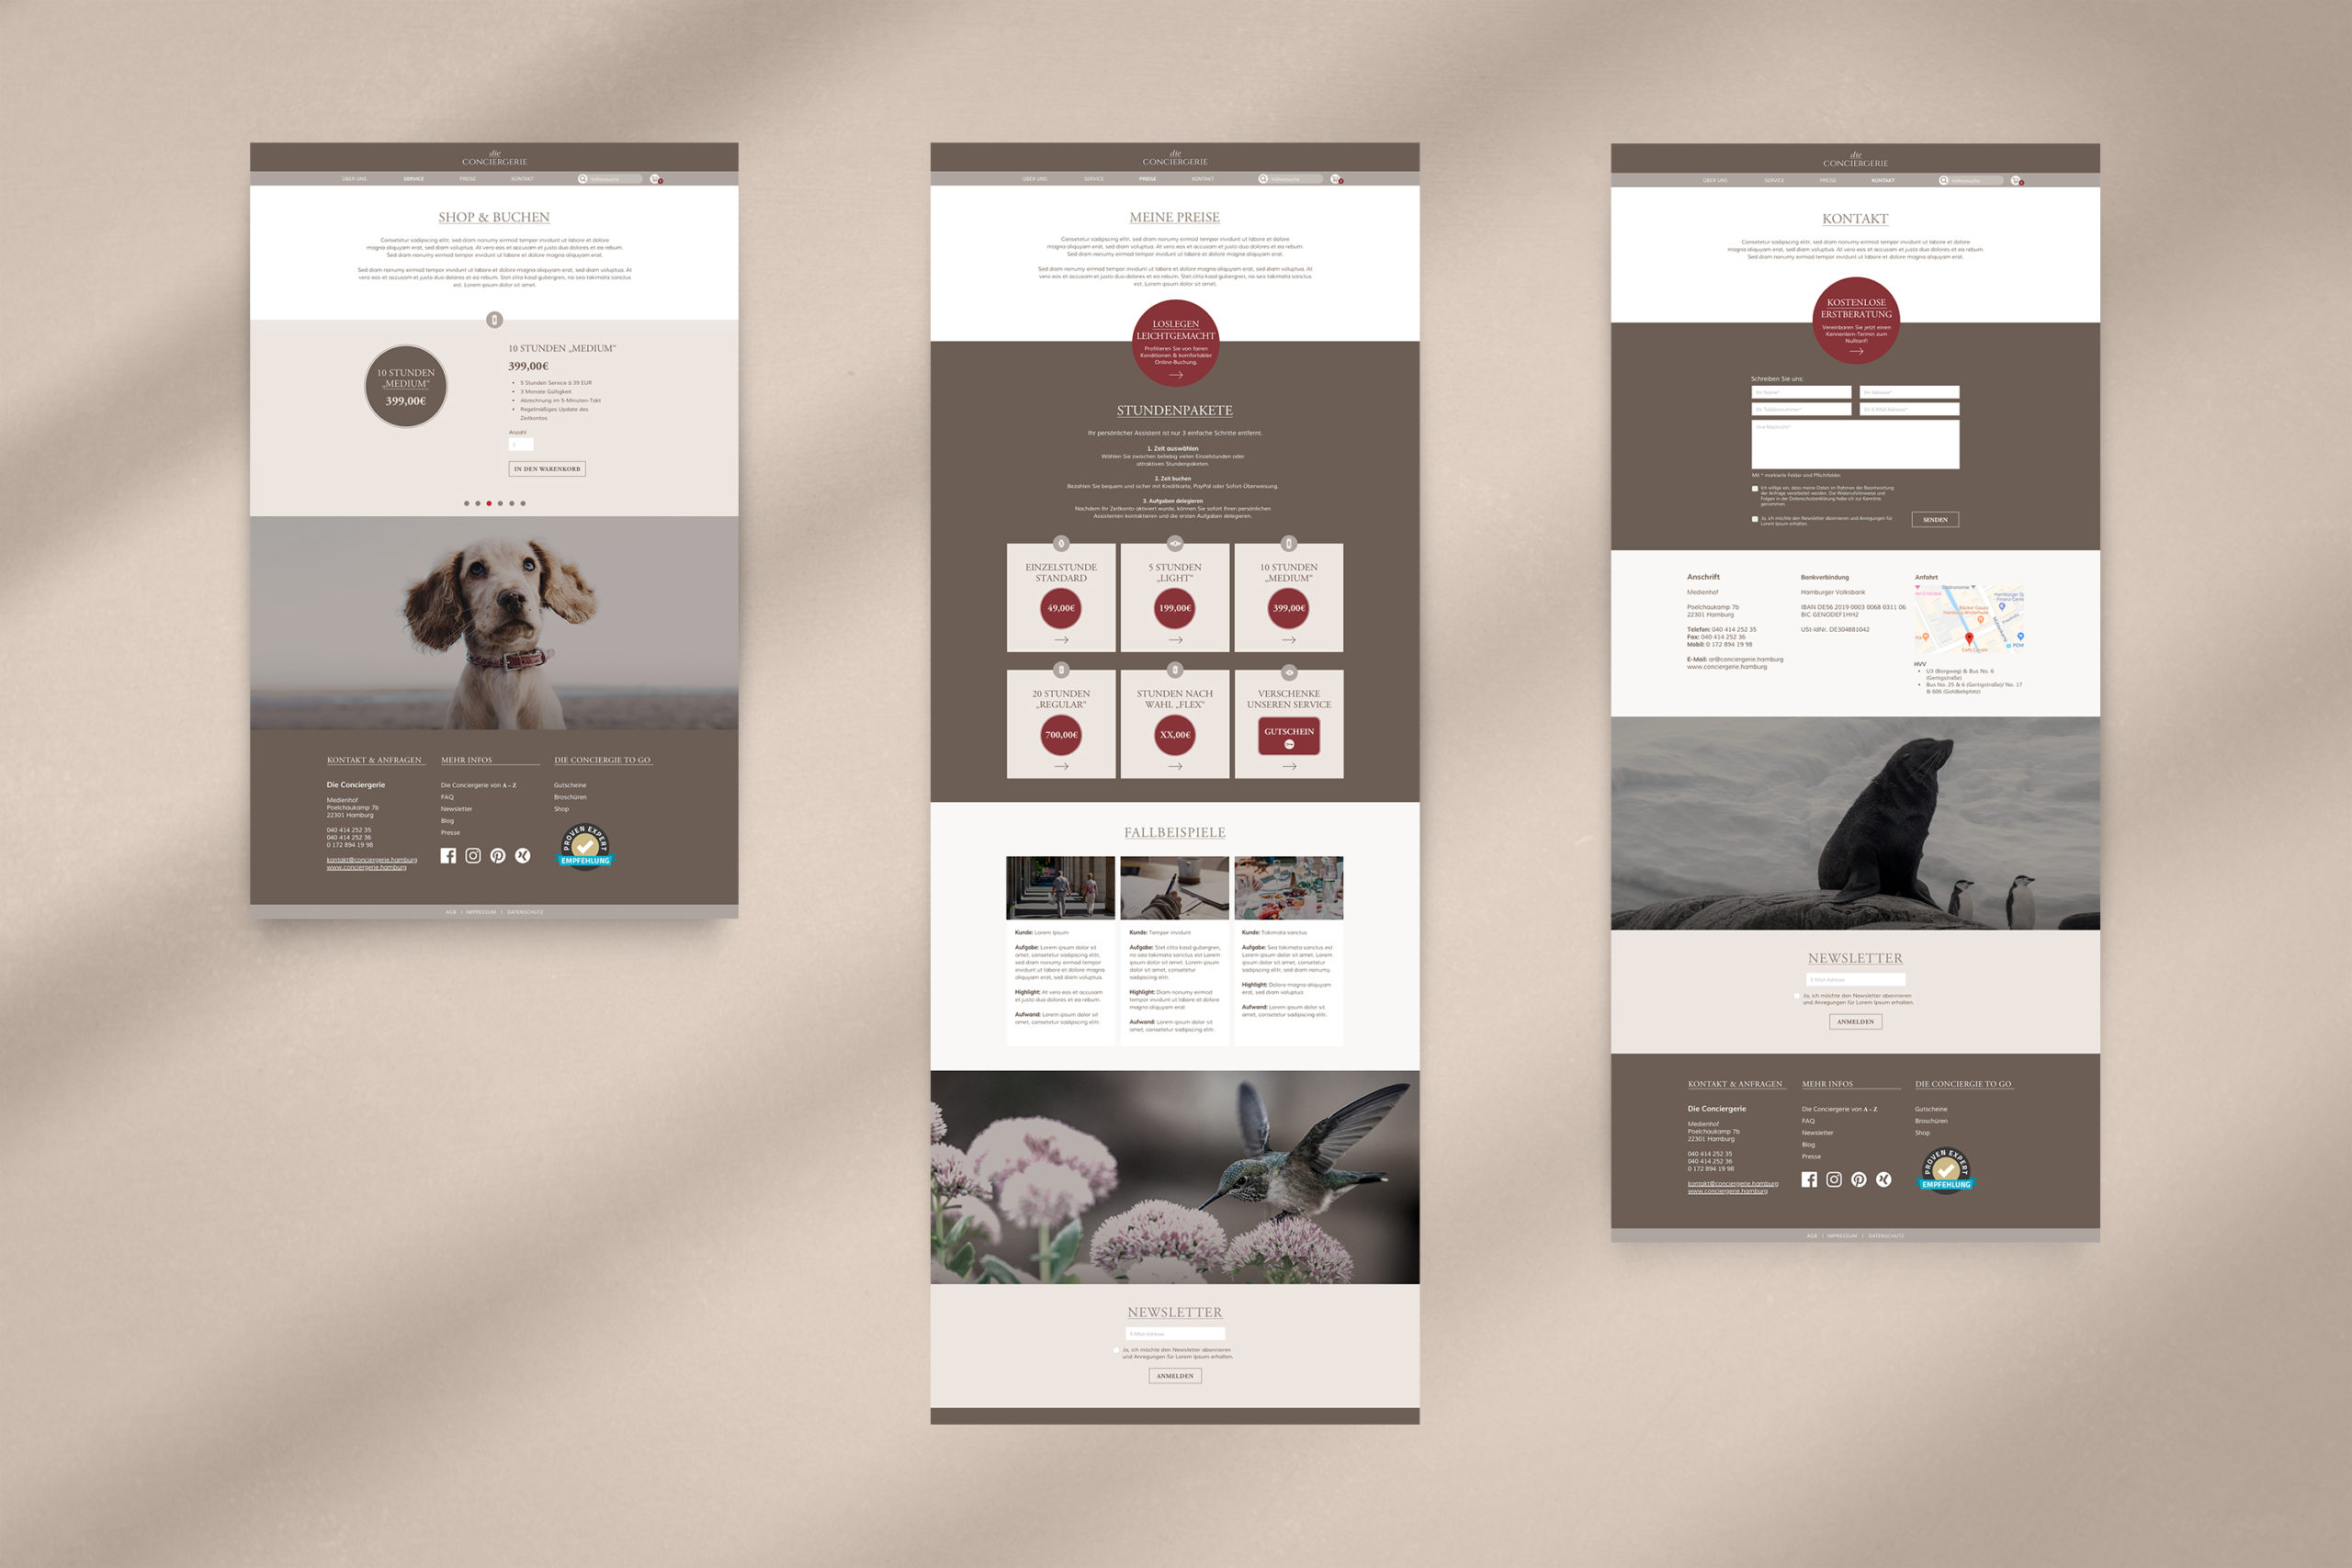 Die Conciergerie Webdesign Screendesign